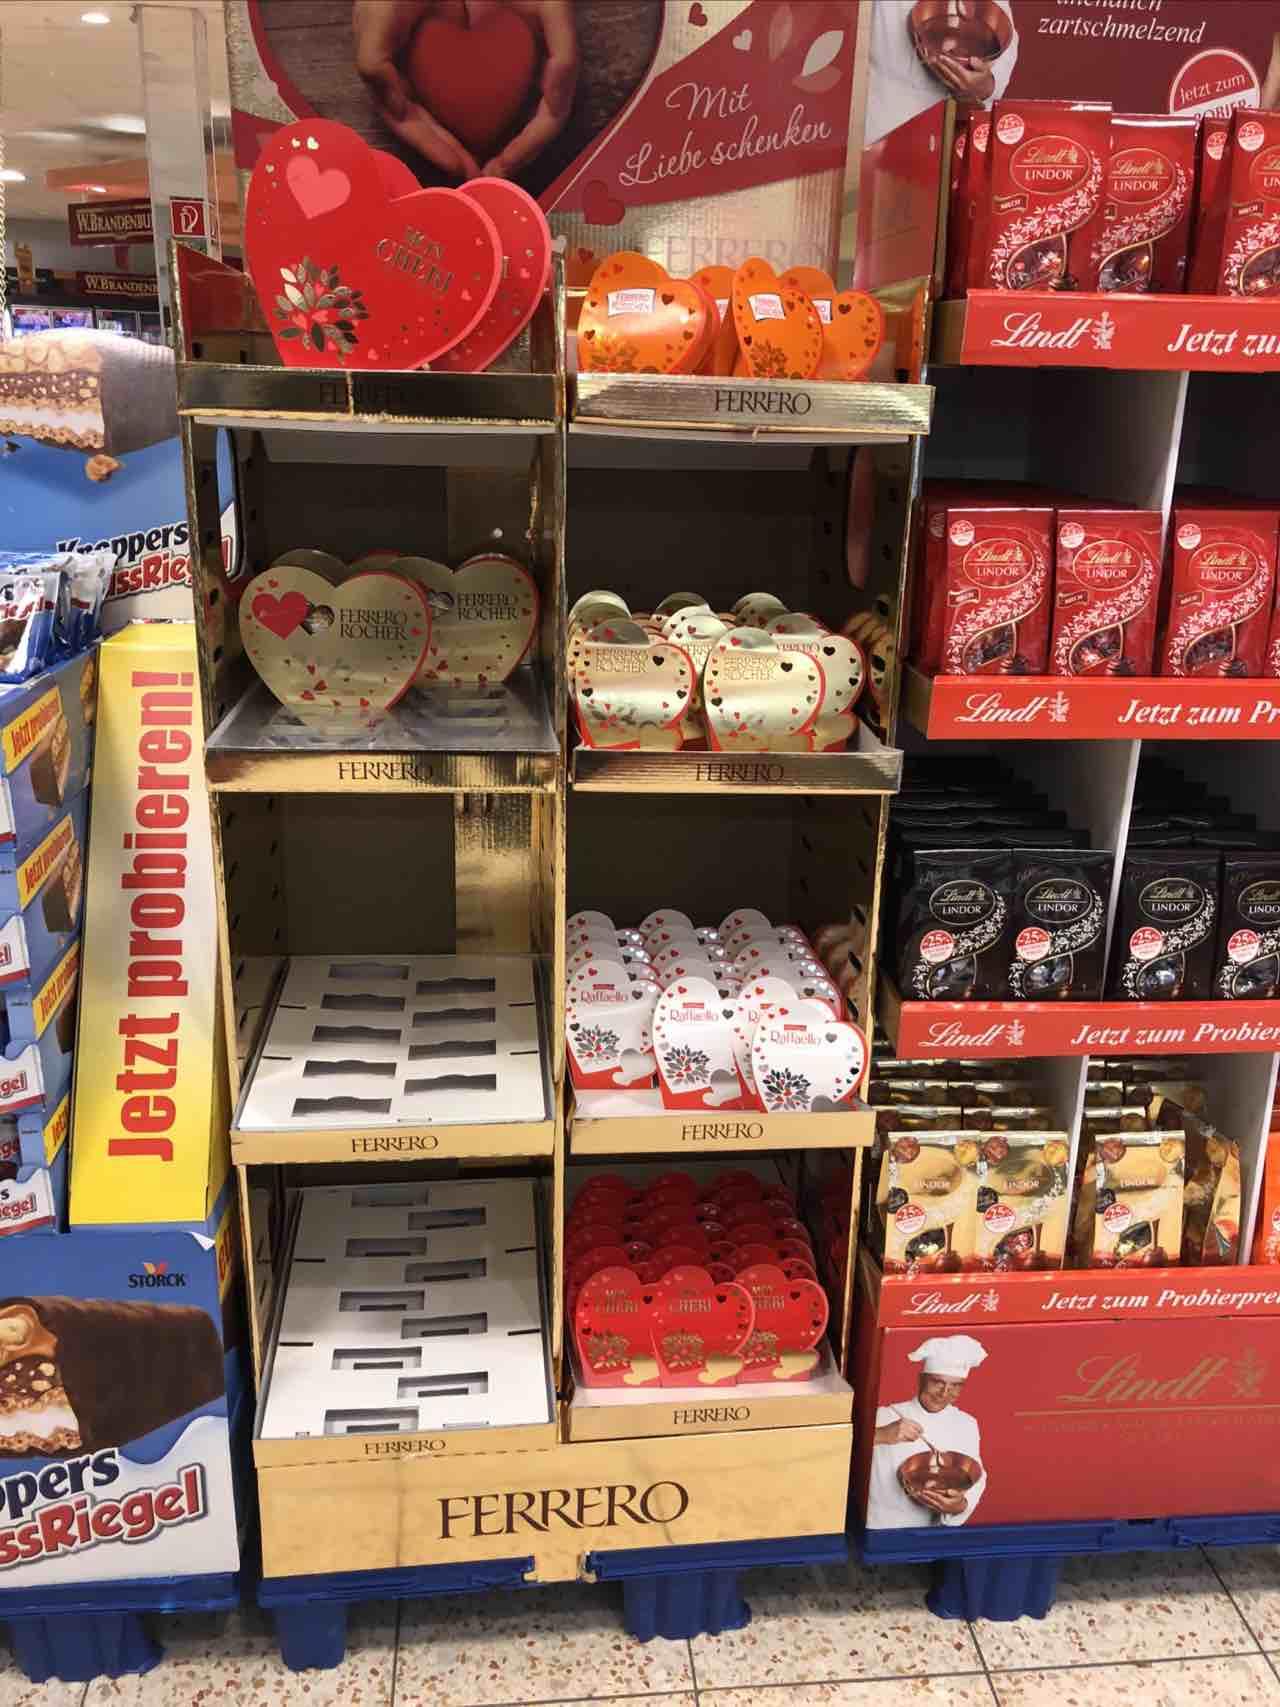 Promotion_Ferrero.jpeg